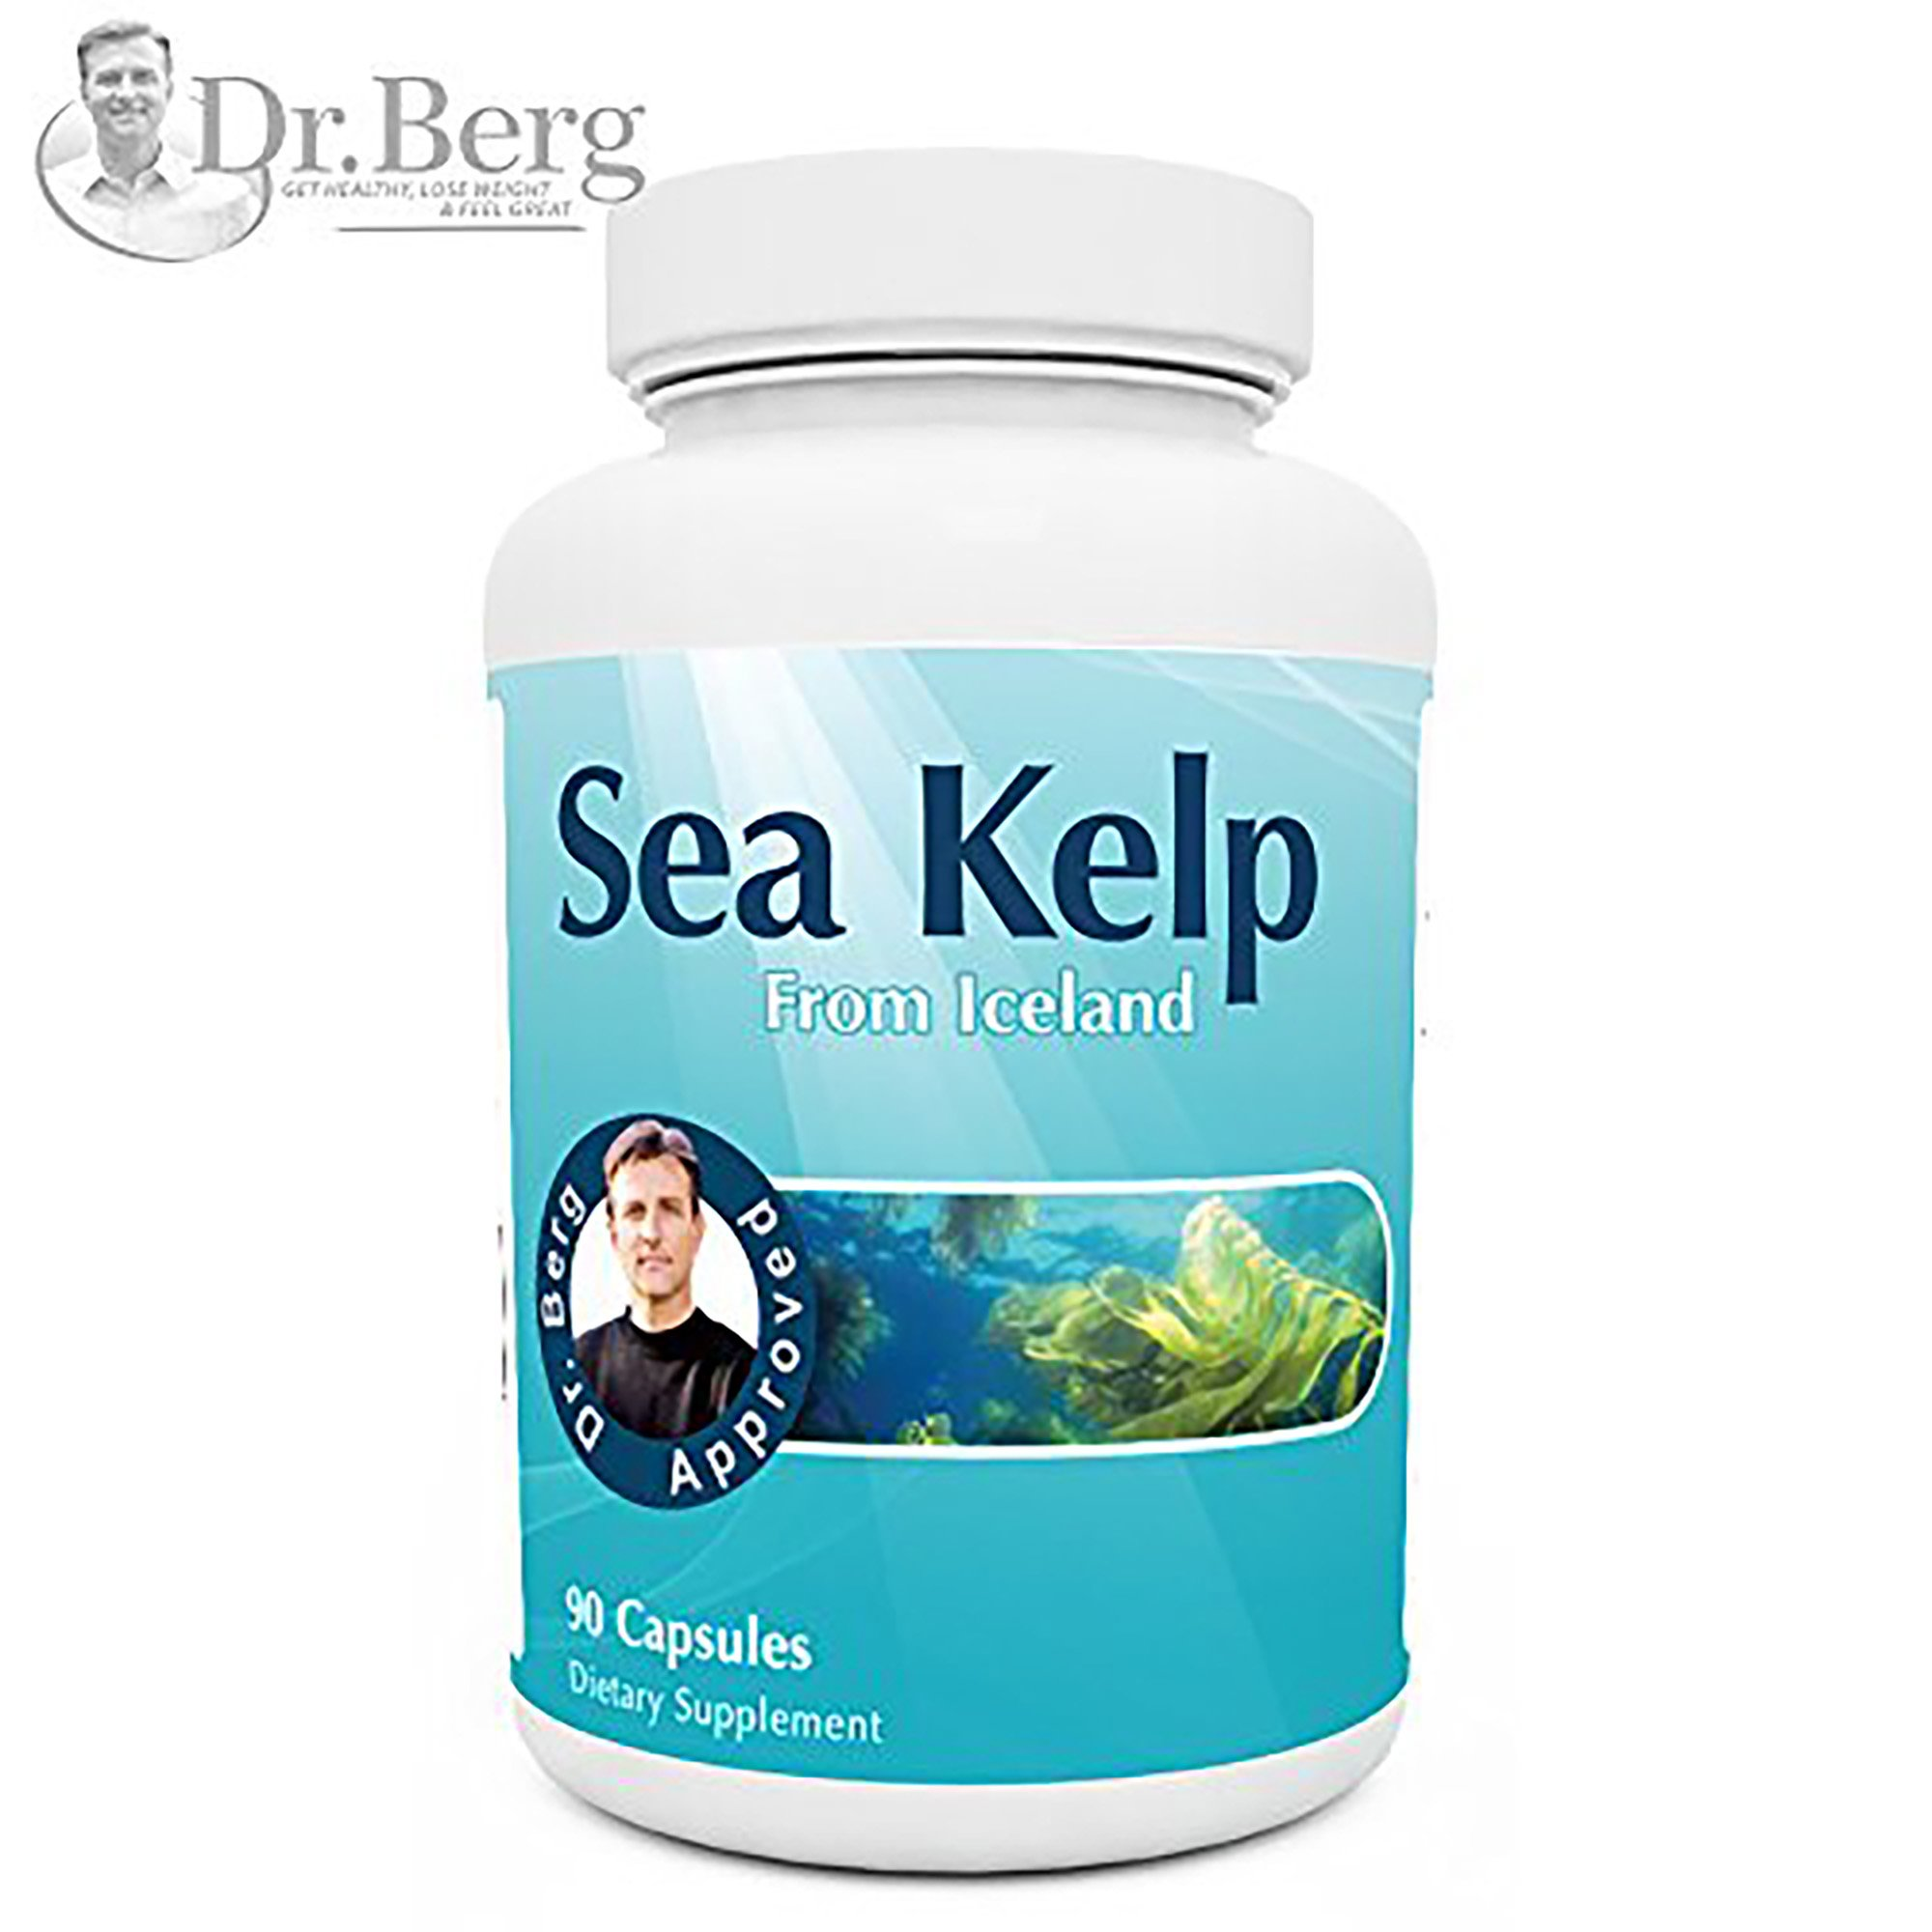 Icelandic Sea Kelp Supplement - Pure Icelandic Sea Kelp - Natural Iodine & Sea Nutrients - 90 Capsules